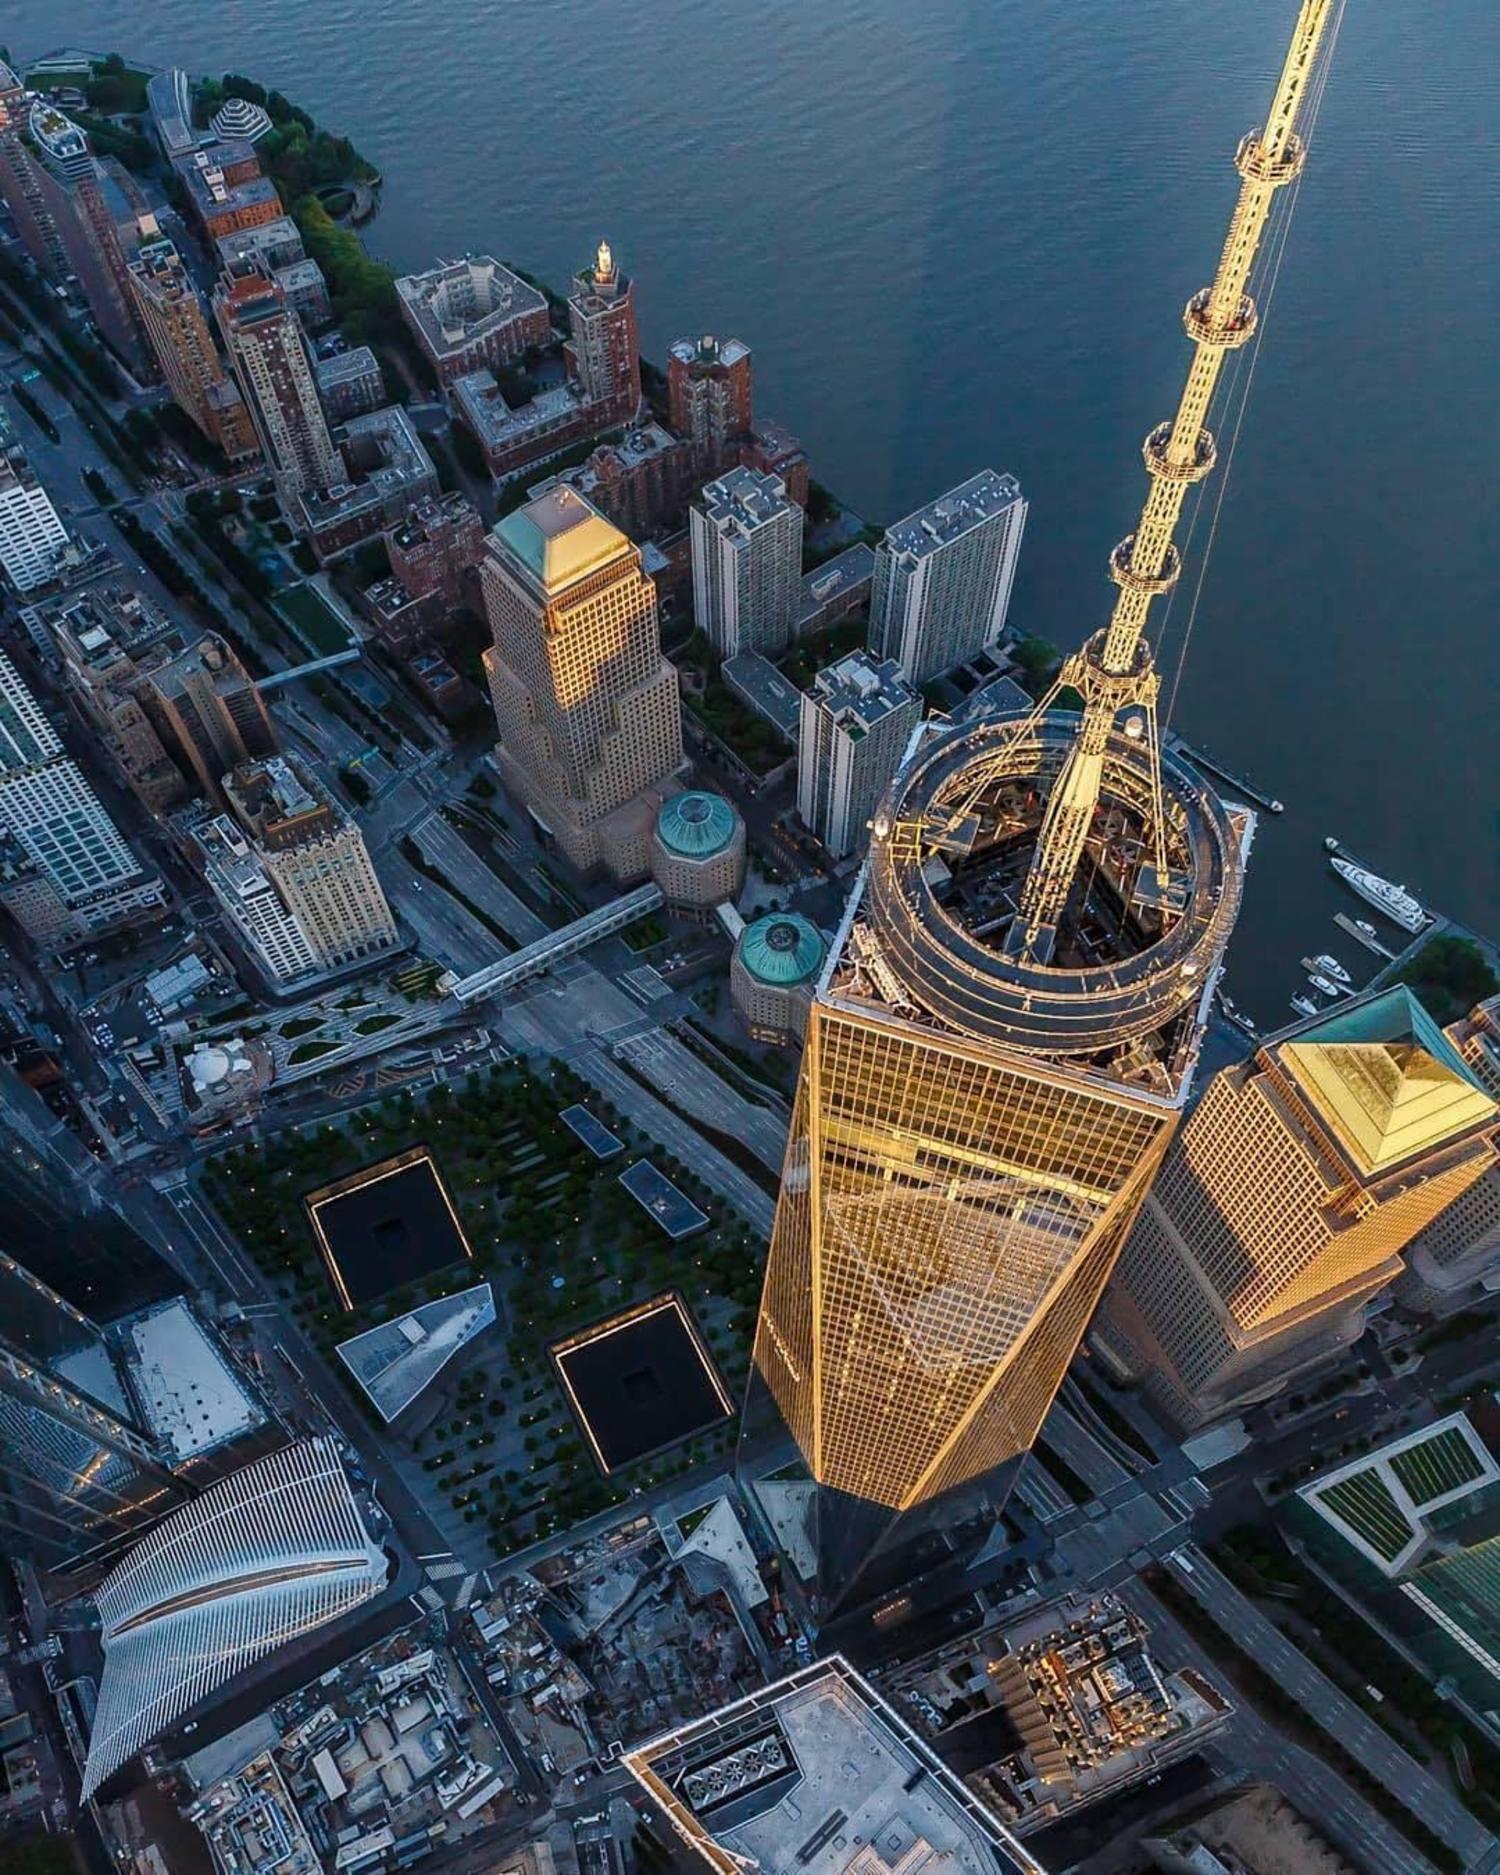 One World Trade Center, New York. Photo via @killahwave #viewingnyc #newyork #newyorkcity #nyc #1wtc #oneworldtradecenter